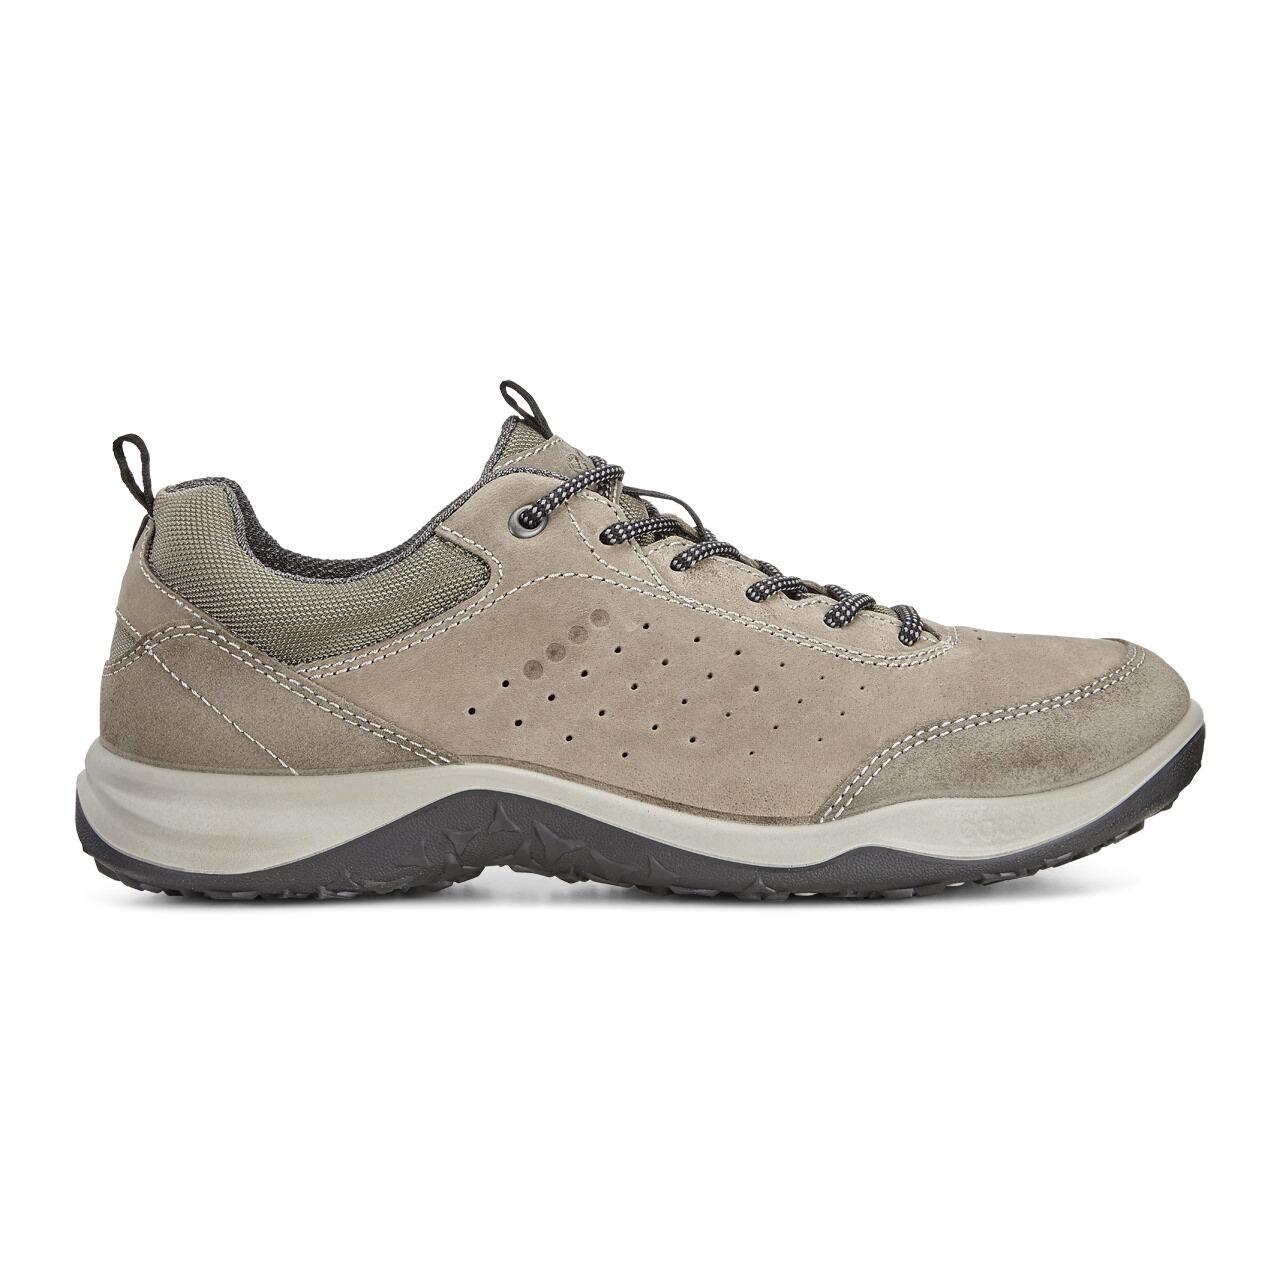 Shoes Espinho Hiking LowMen's Ecco® Ecco Mens OukPiTXZ